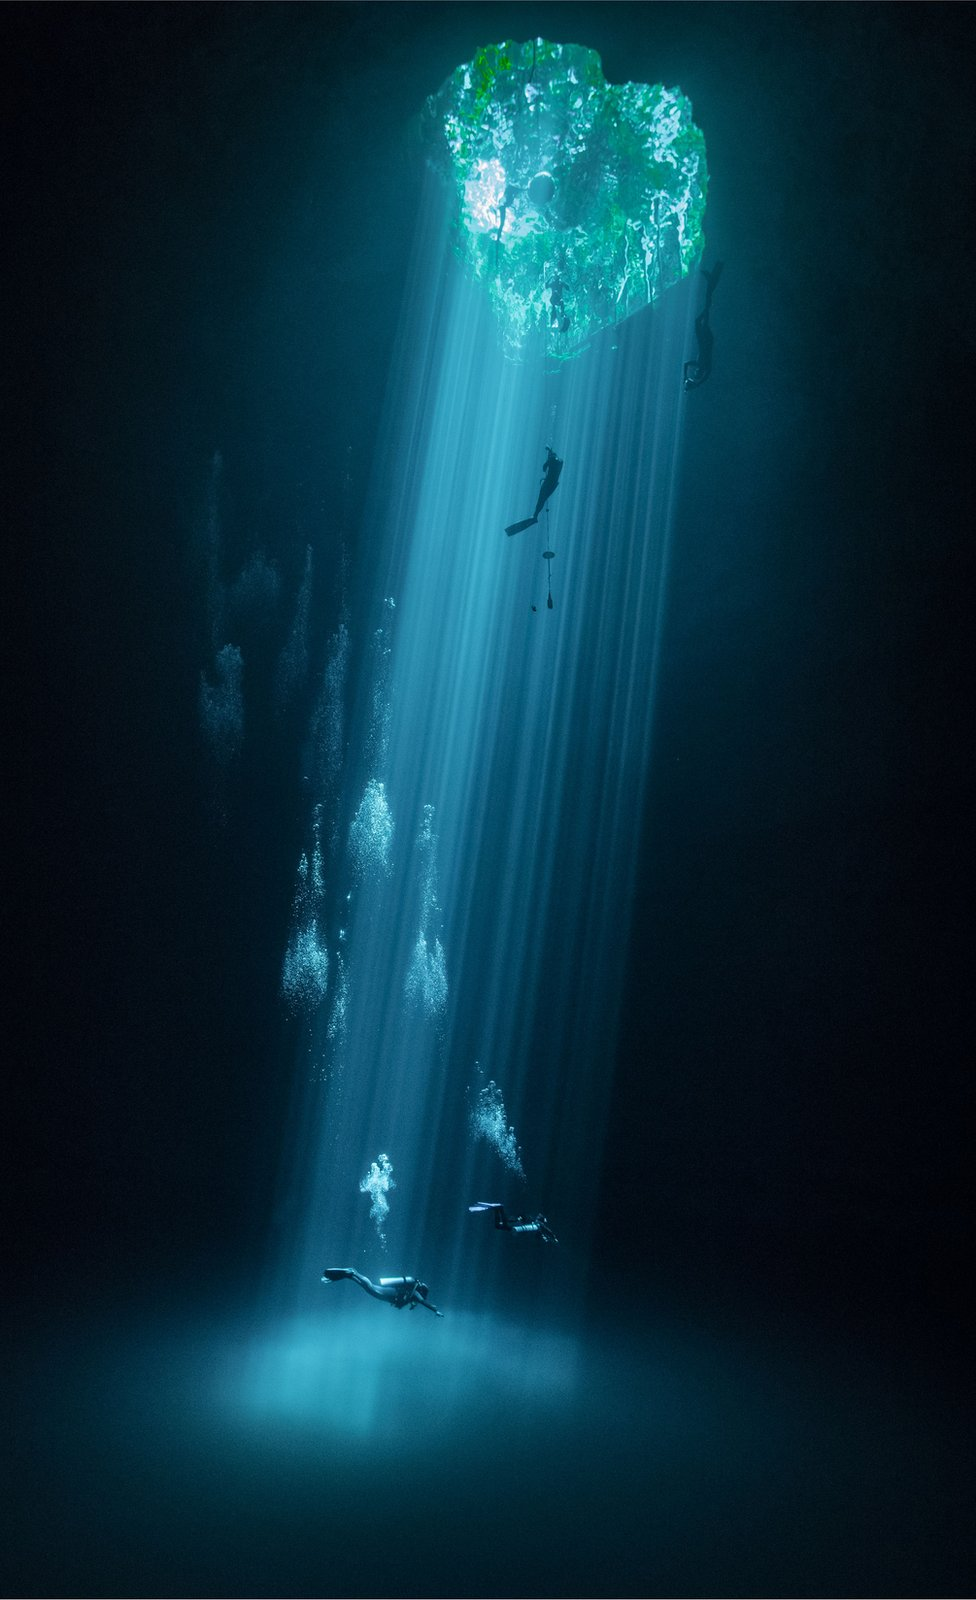 Ronilac u podvodnoj pećini